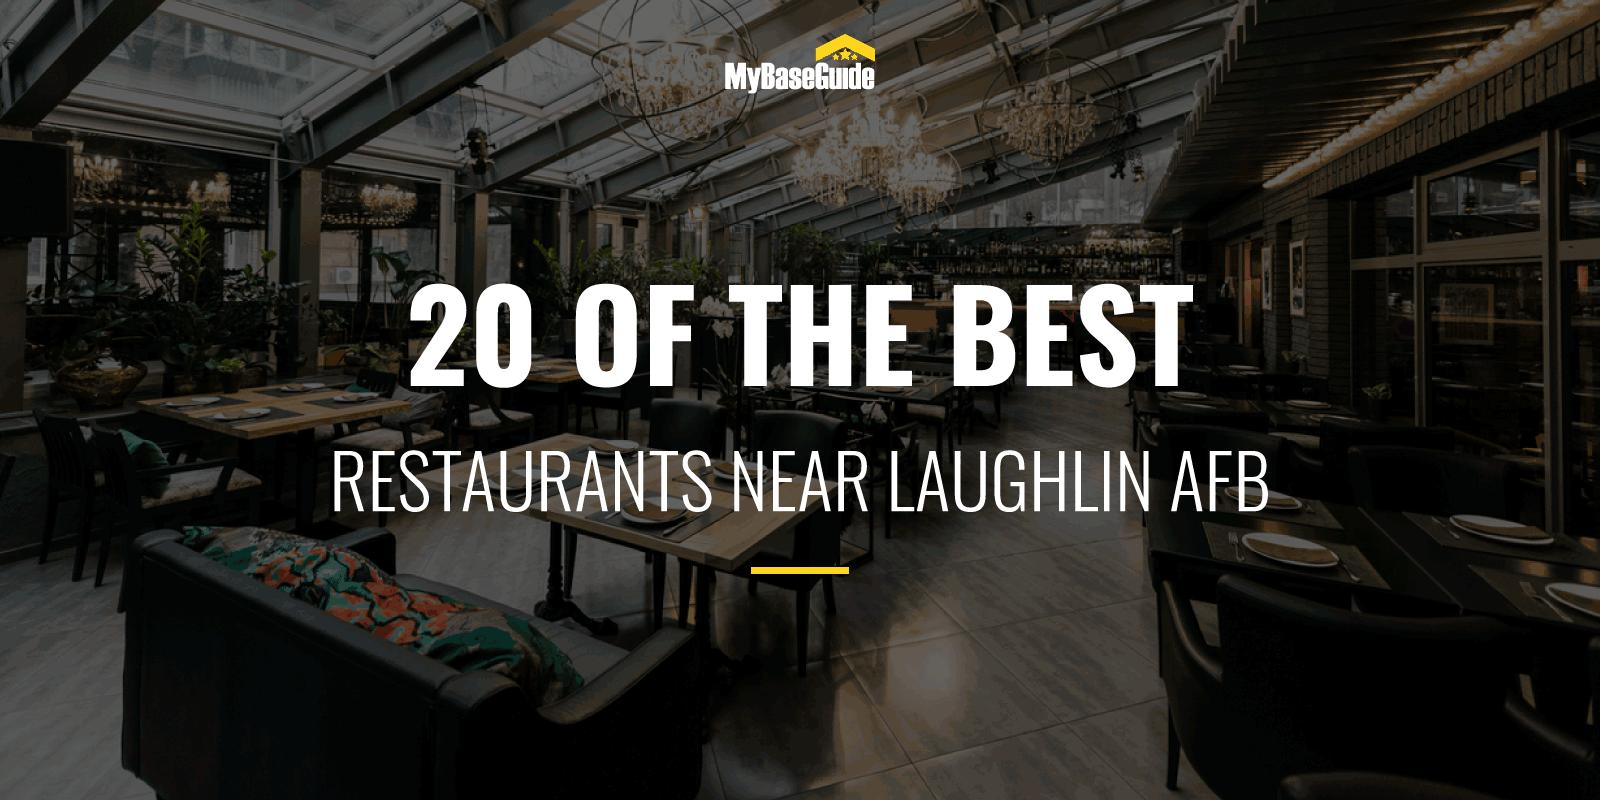 20 of the Best Restaurants Near Laughlin AFB